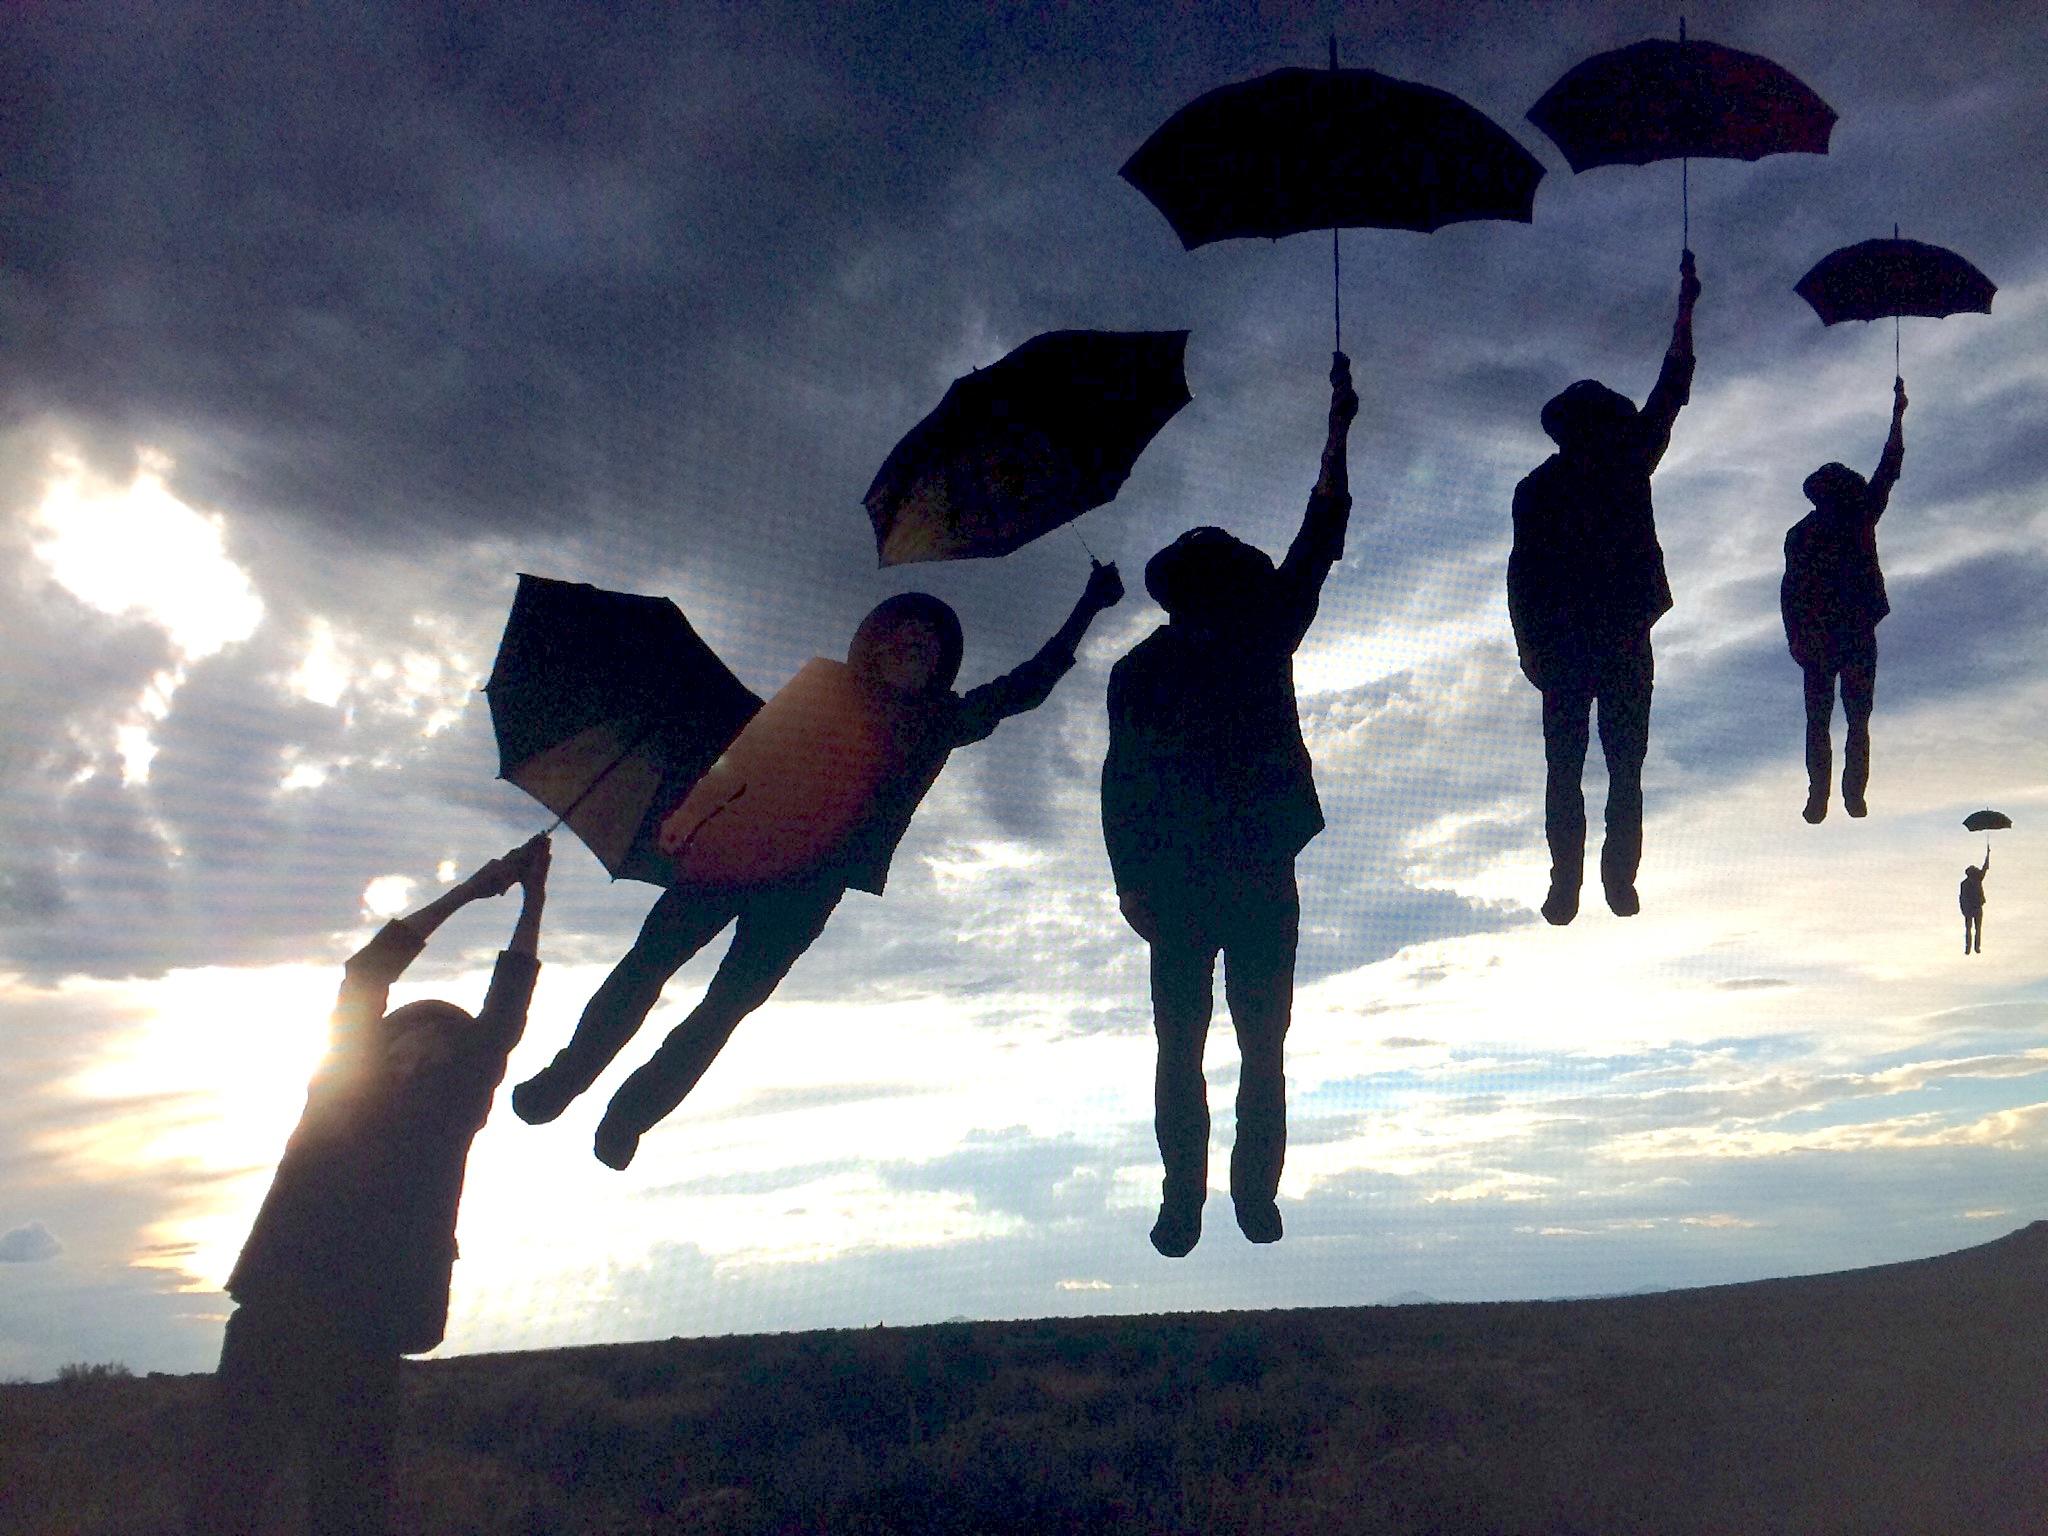 UmbrellaMen by H Sparrow.JPG